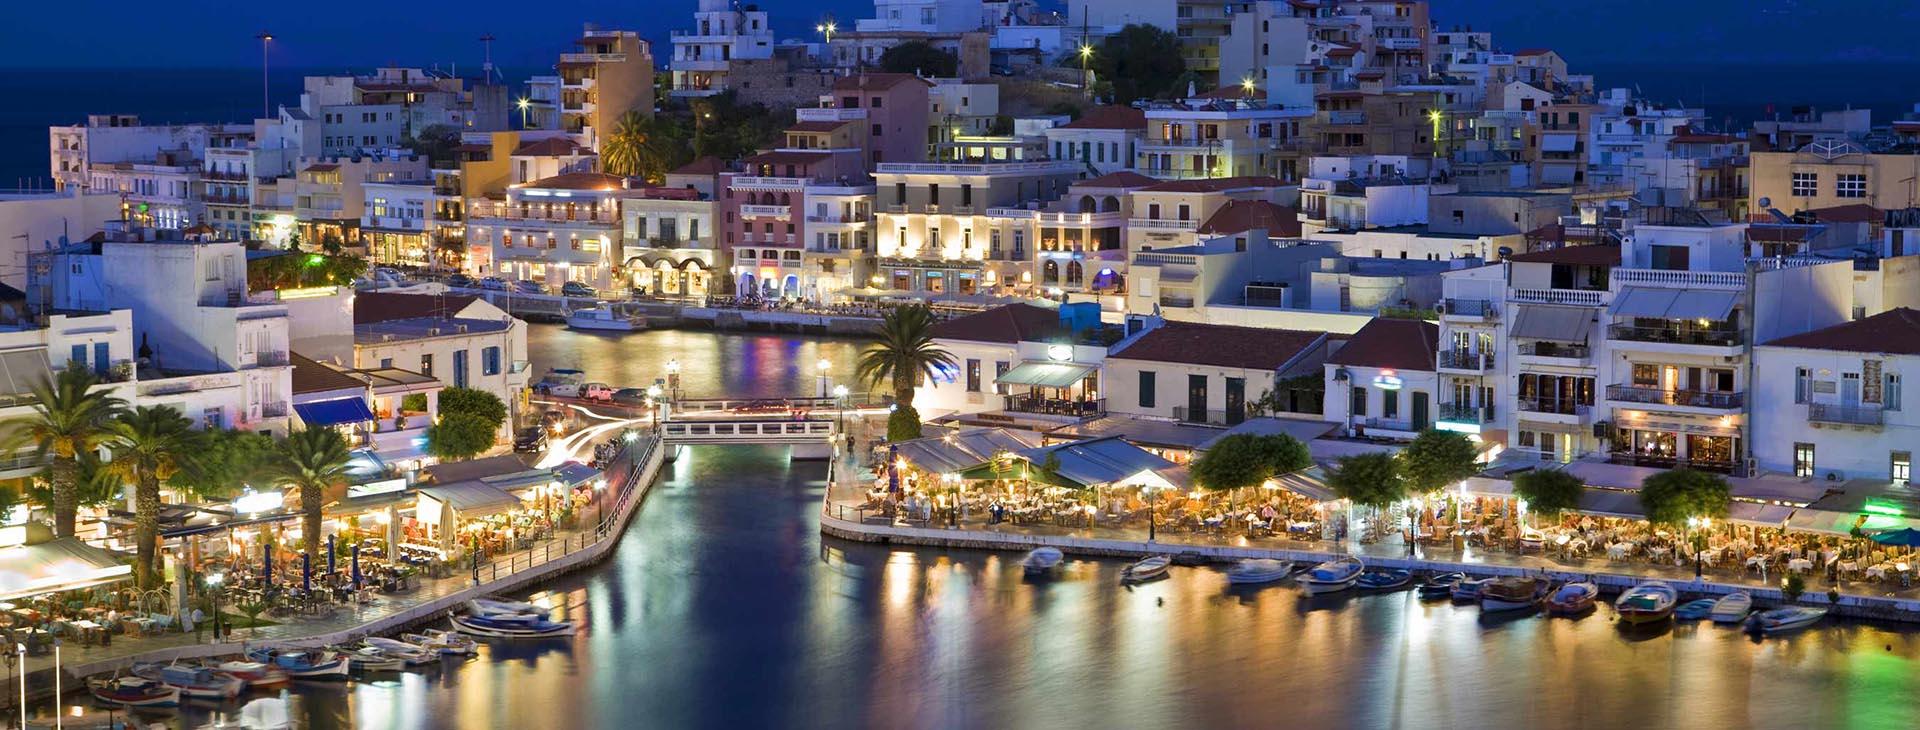 Agios Nikolaos by night, Lassithi